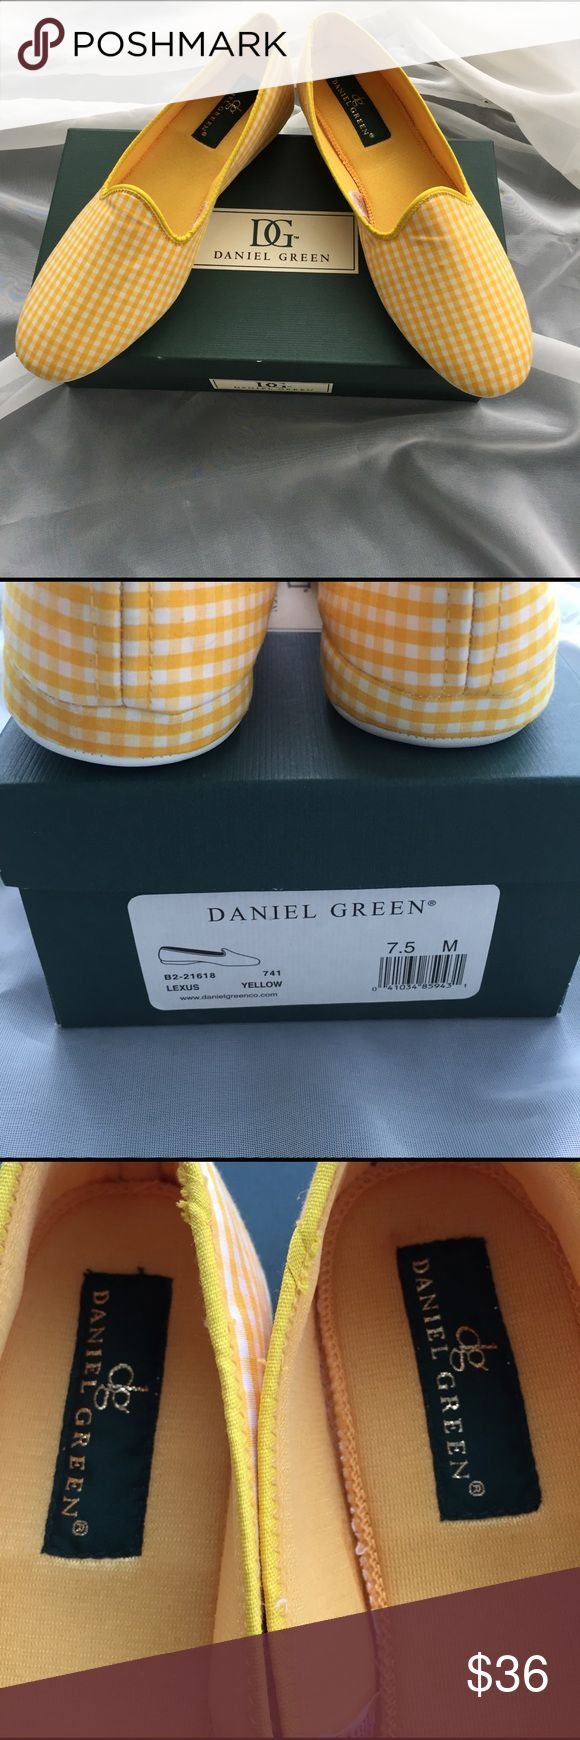 Daniel Green Slippers Daniel Green Slippers, NWOT, original box, pretty yellow gingham Daniel Green Shoes Slippers